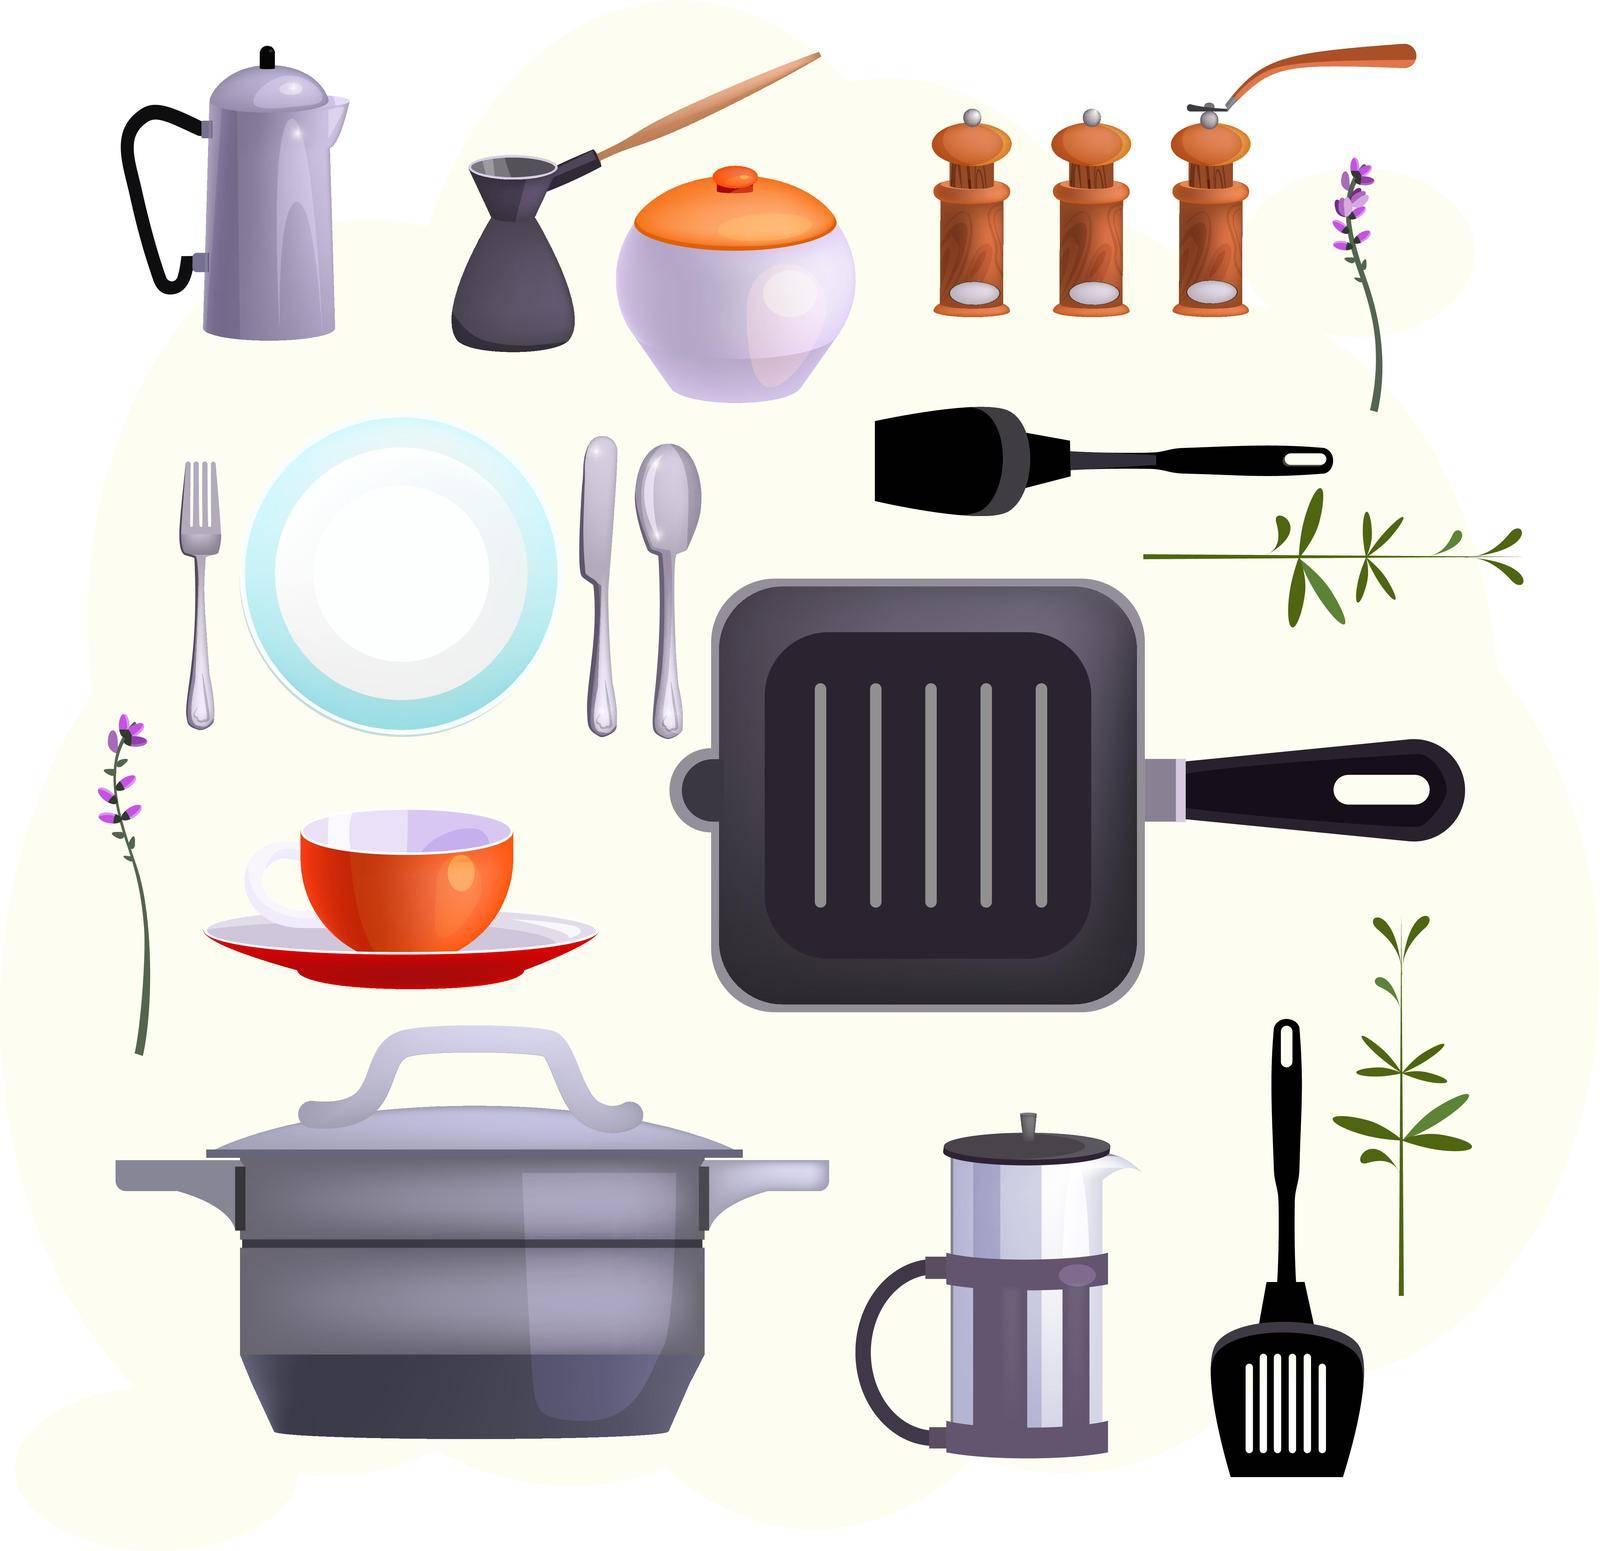 Kitchen equipment icons by mstjahanara